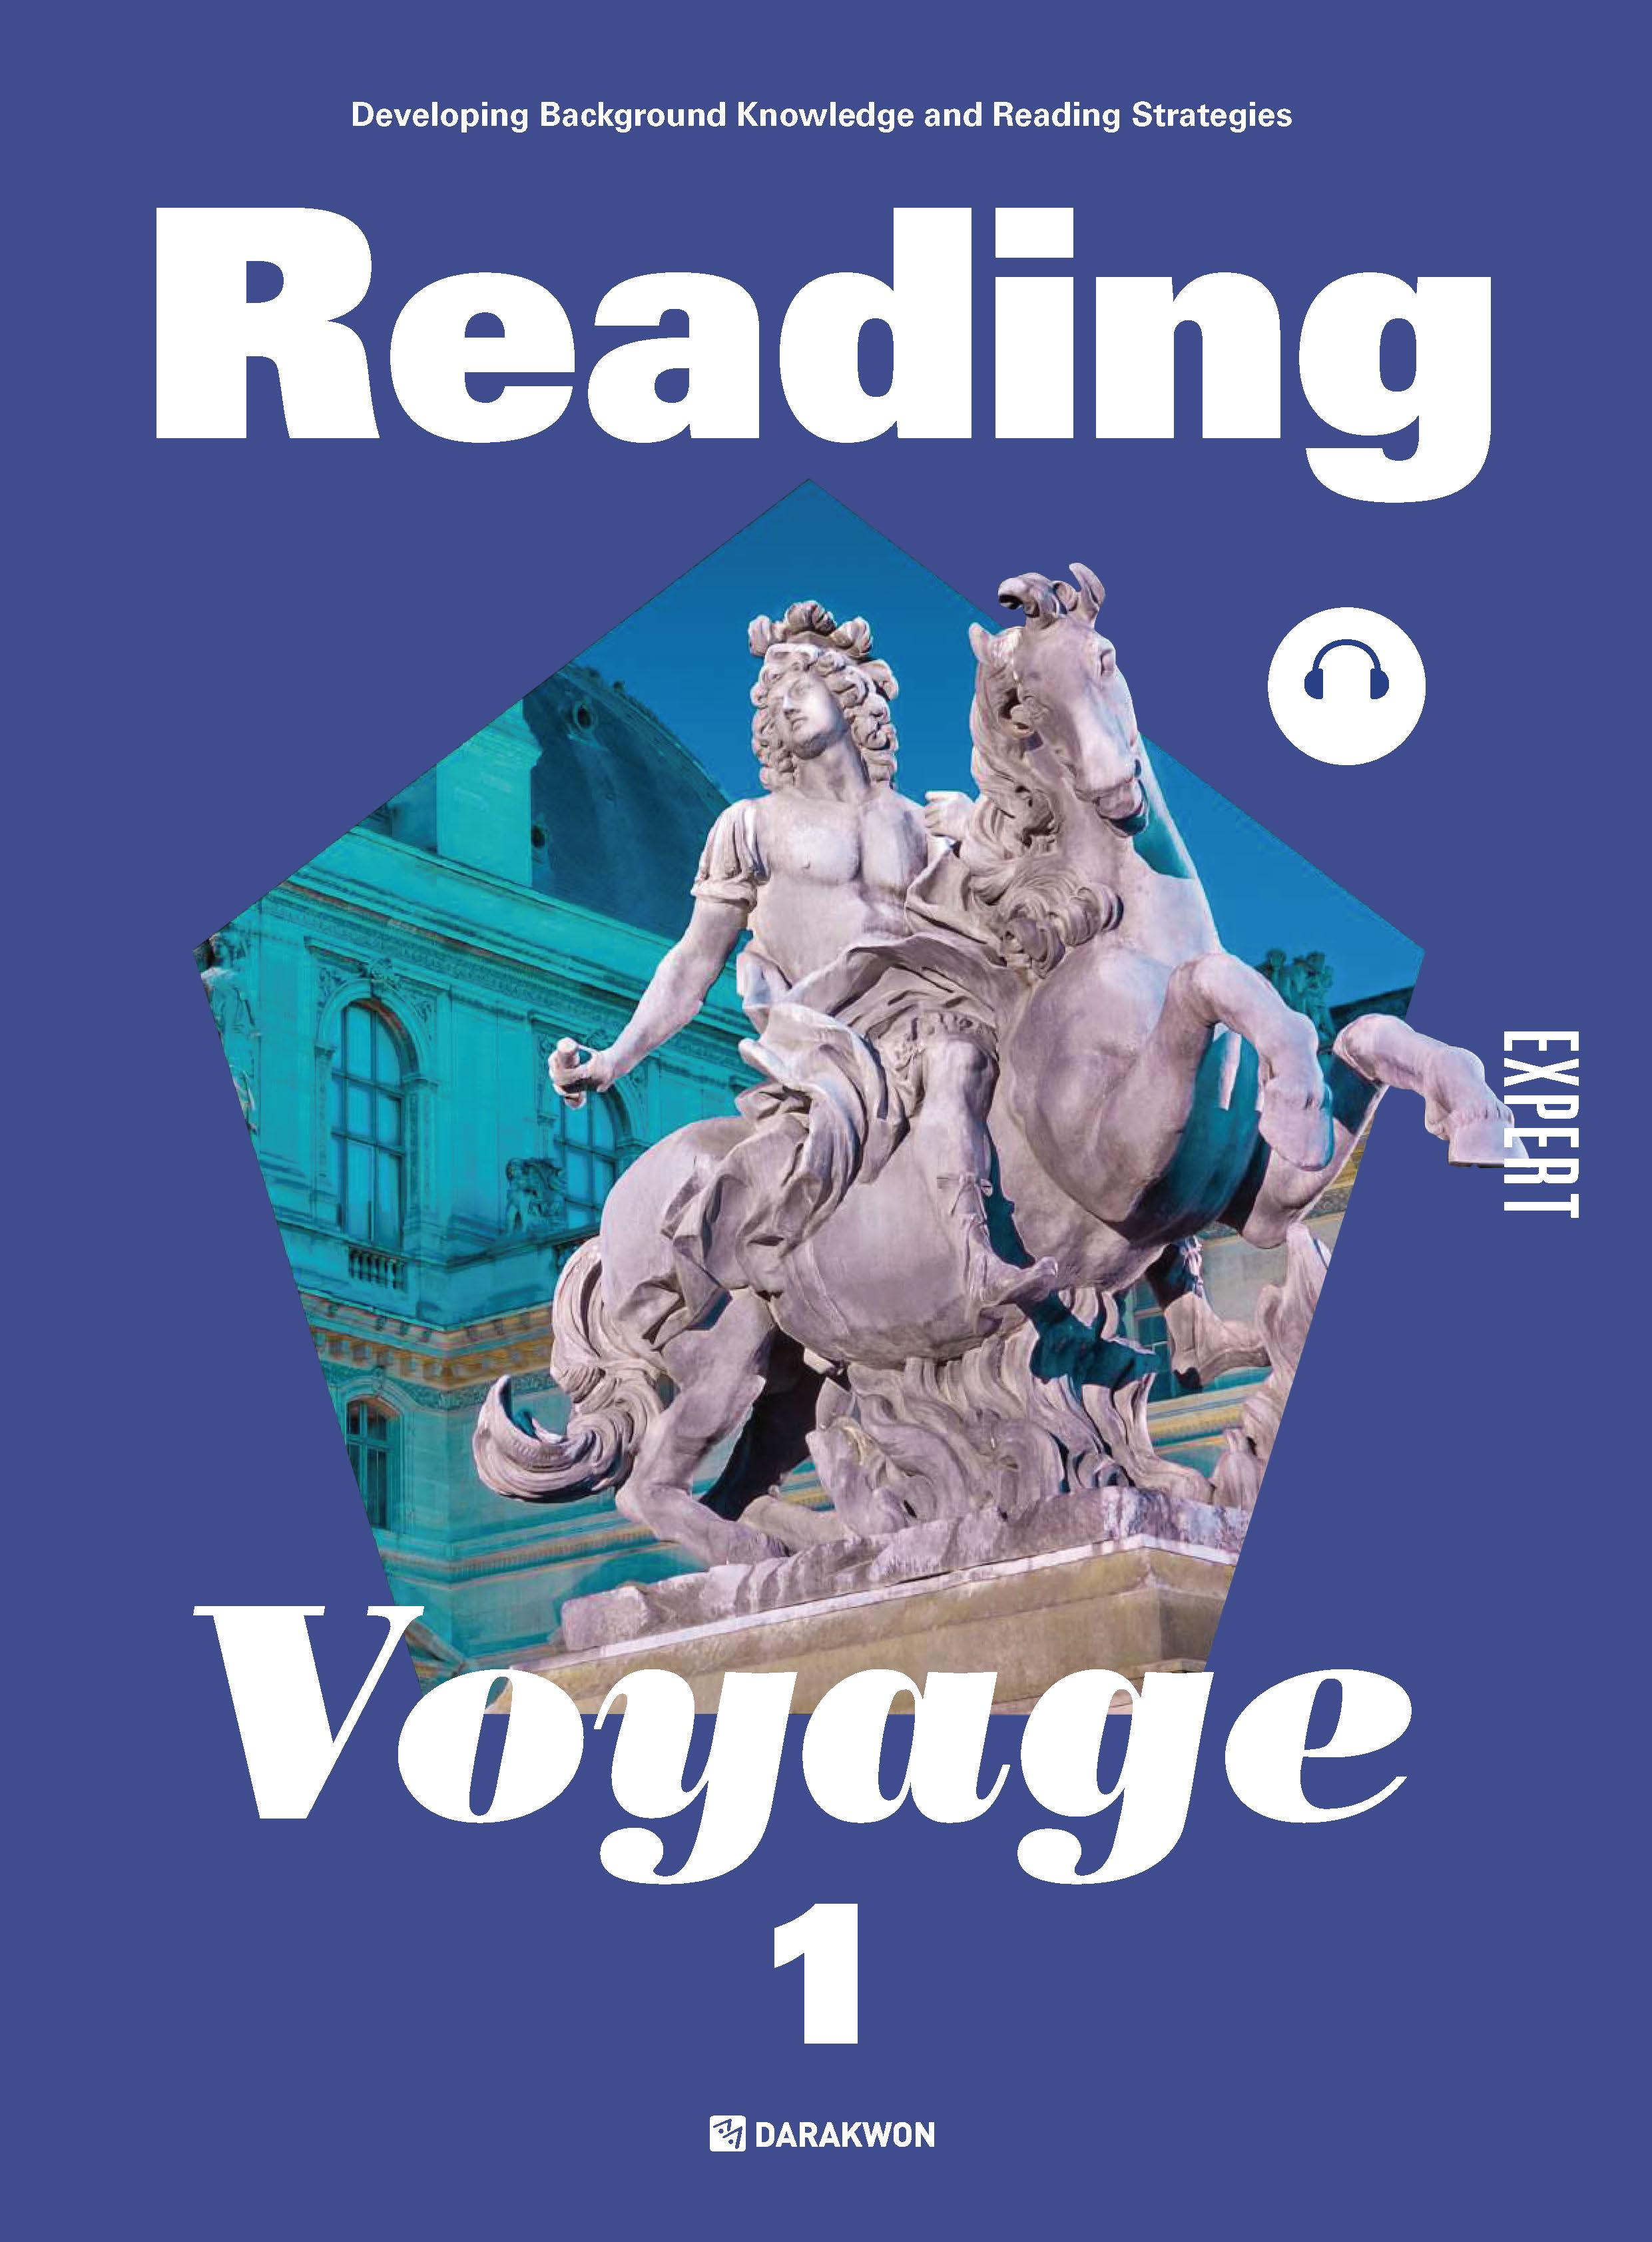 [Reading Voyage] Reading Voyage EXPERT 1